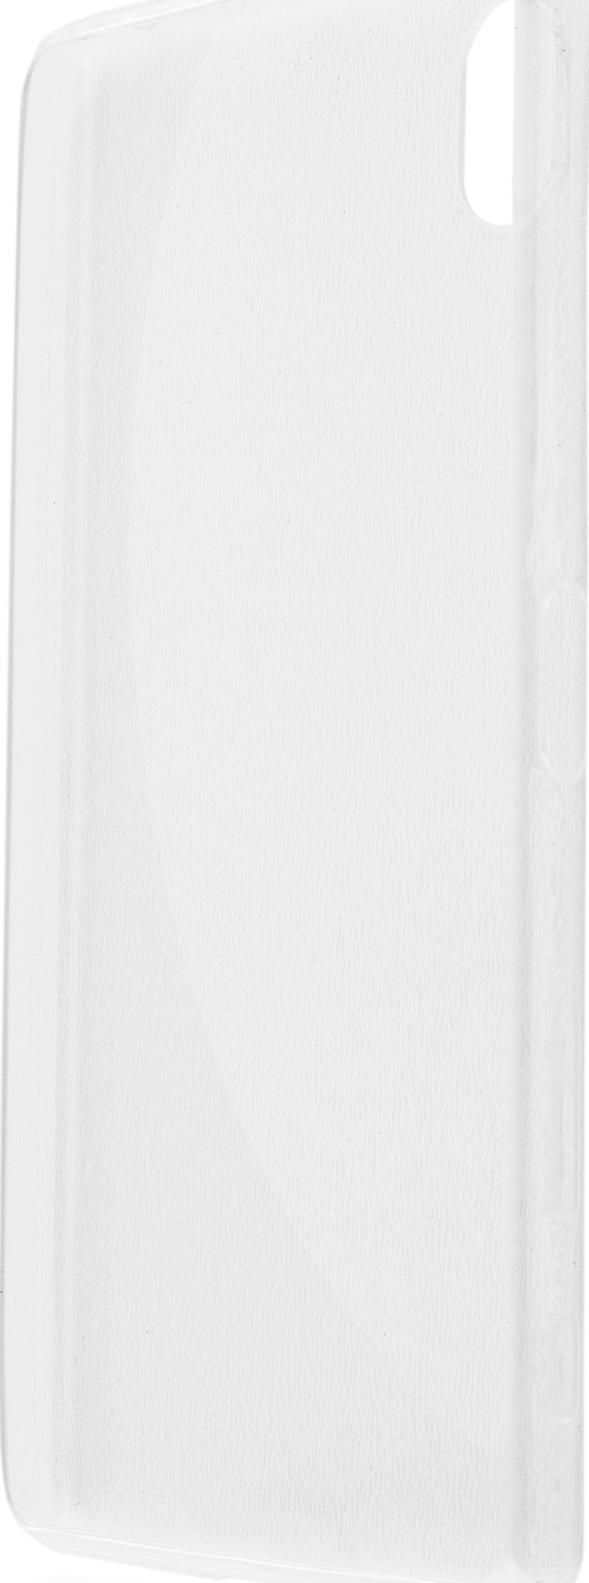 Чехол Brosco TPU для Sony Xperia X Perfomance, прозрачный sony f8131 xperia x perfomance lime gold